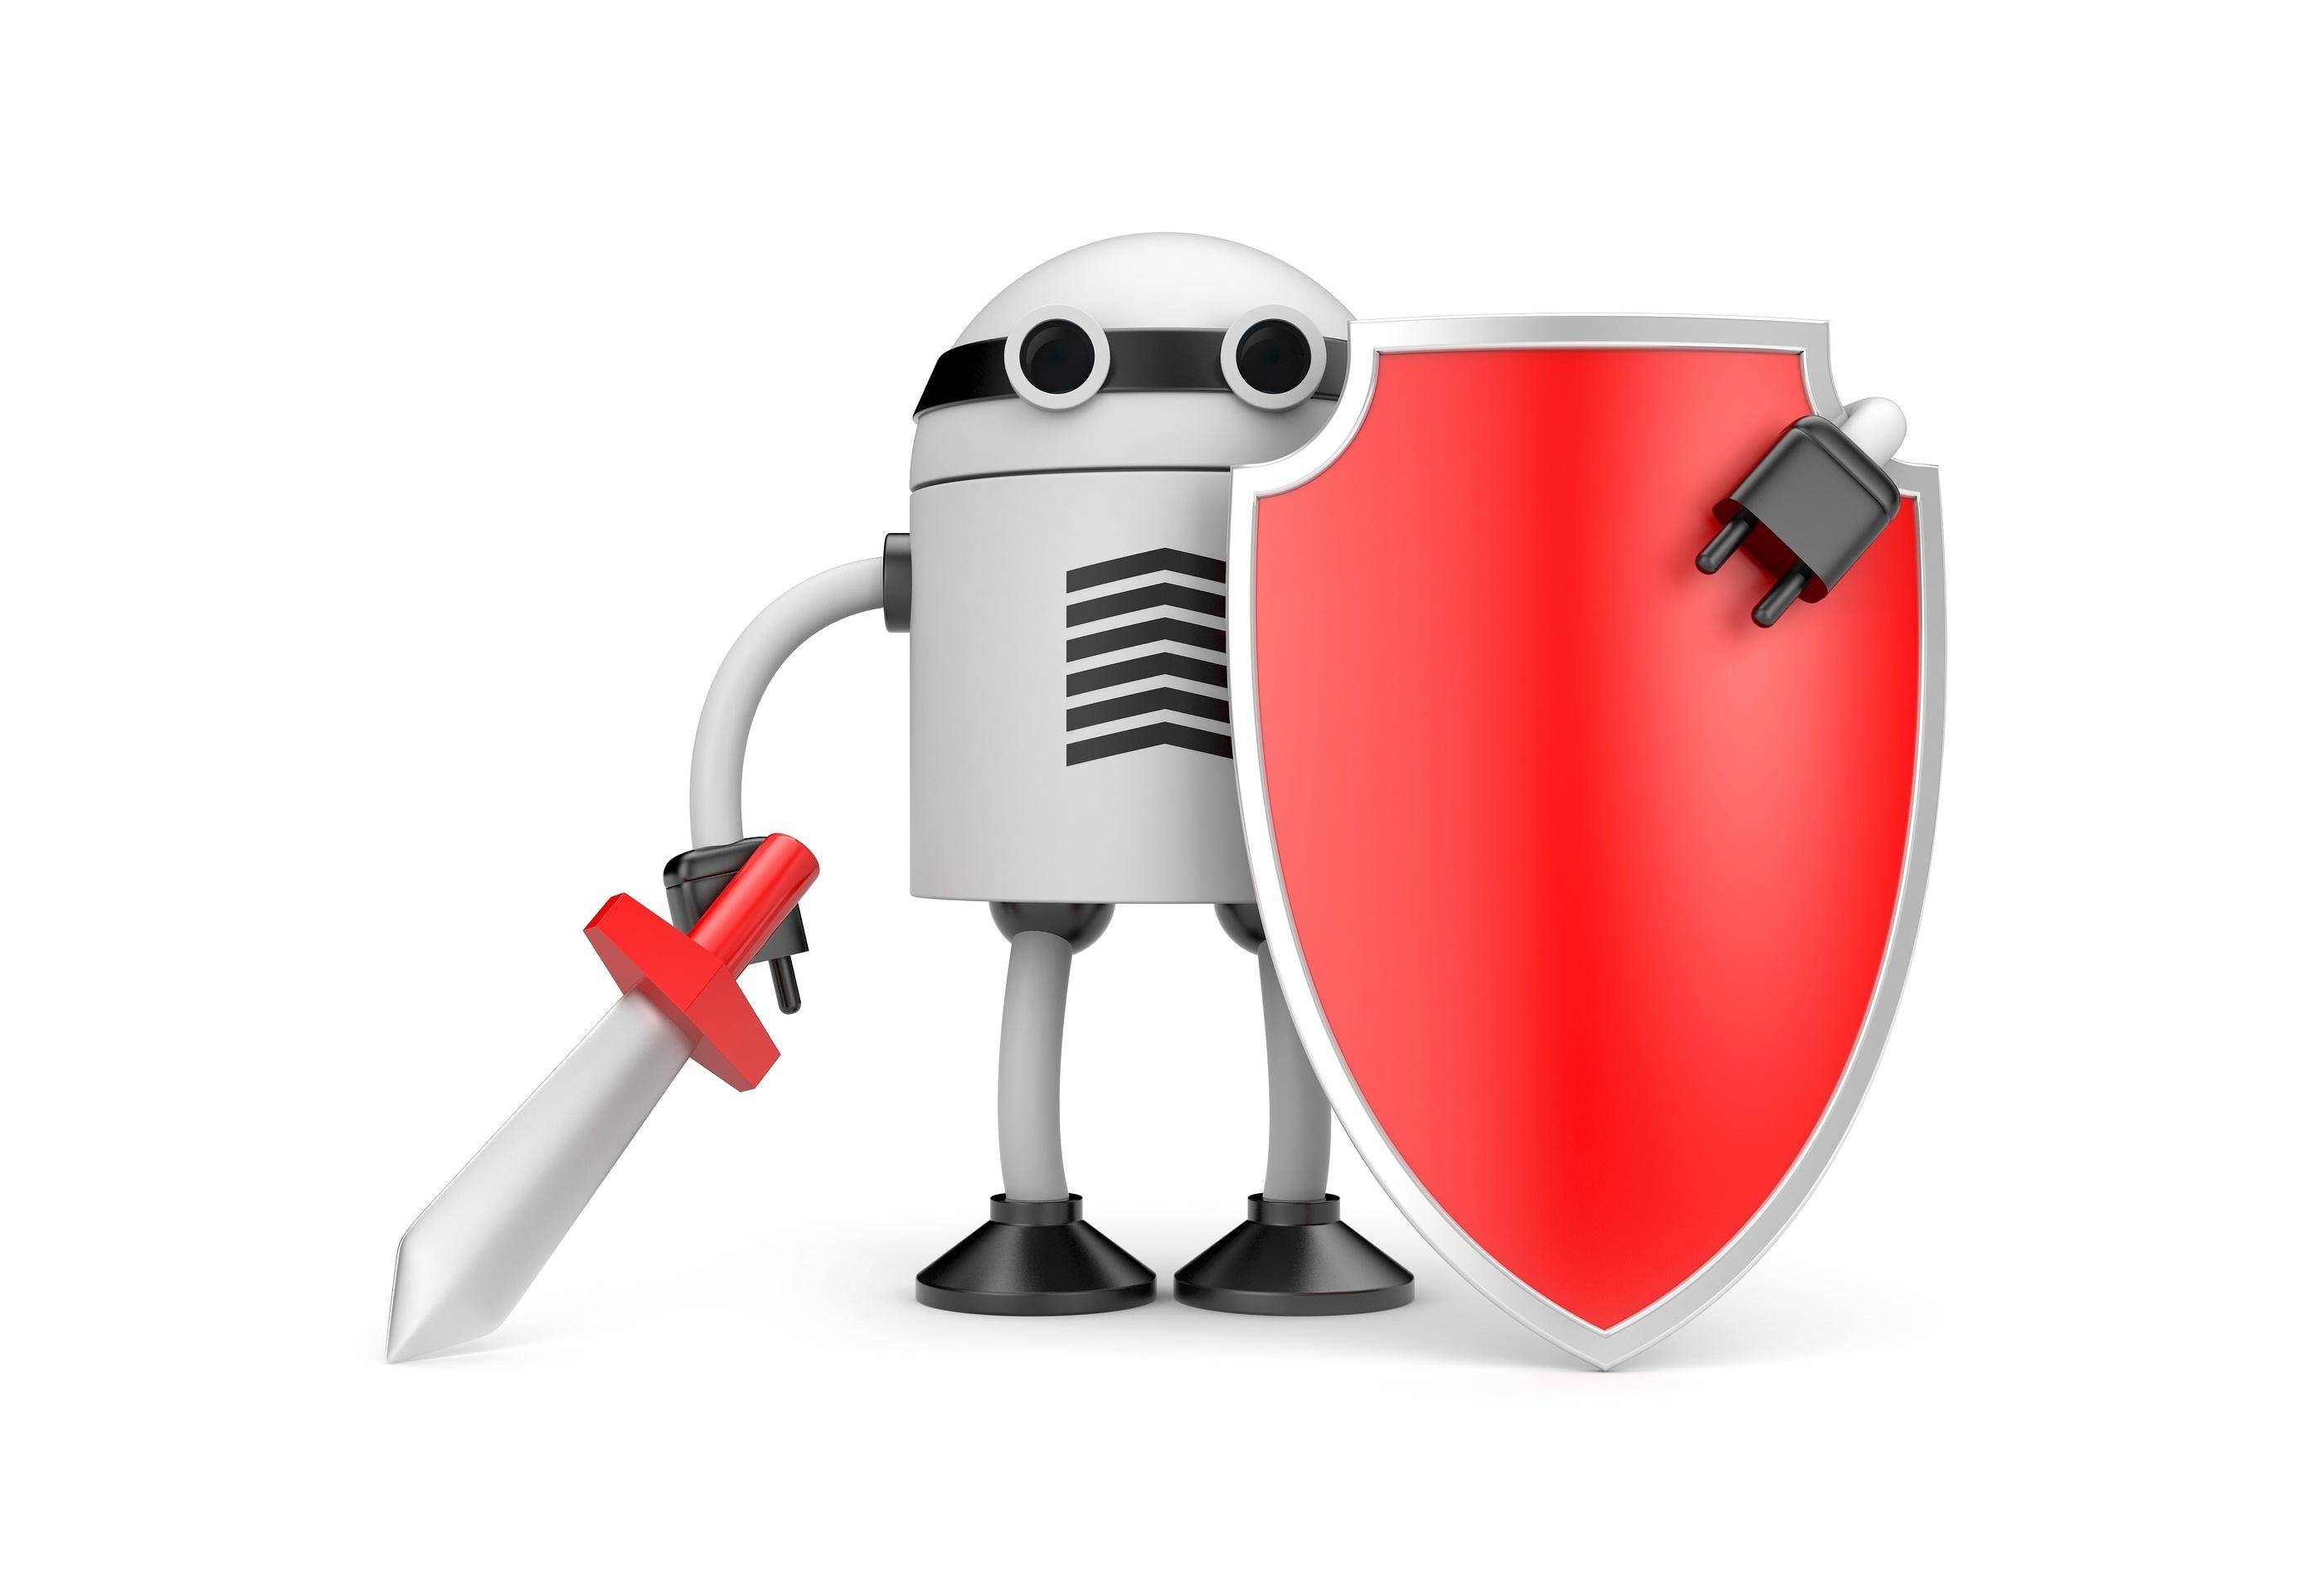 bigstock-Defender-21485375.jpg